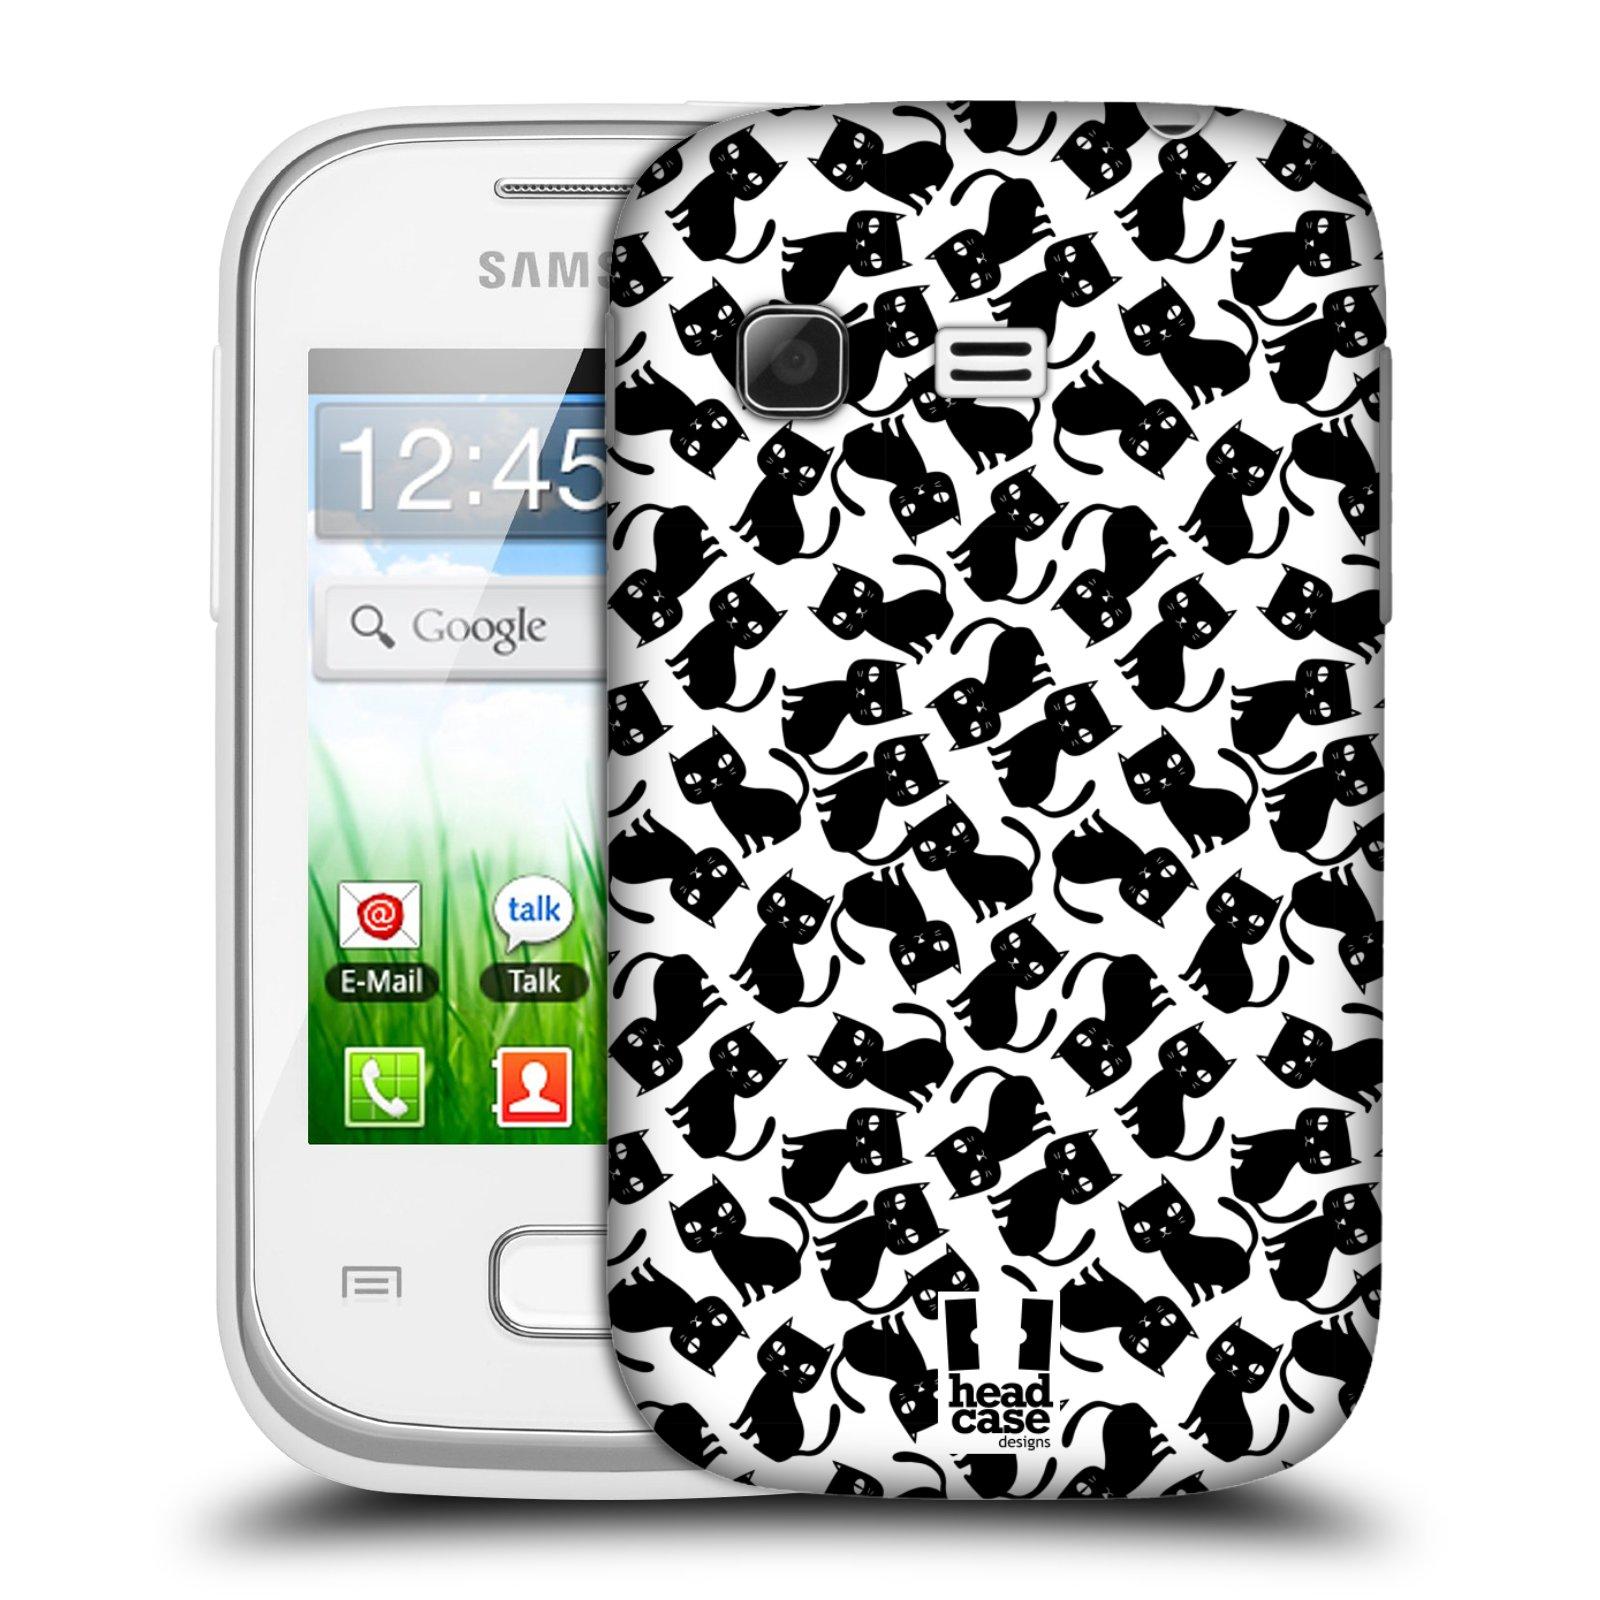 Plastové pouzdro na mobil Samsung Galaxy Pocket HEAD CASE KOČKY Black Pattern (Kryt či obal na mobilní telefon Samsung Galaxy Pocket GT-S5300)